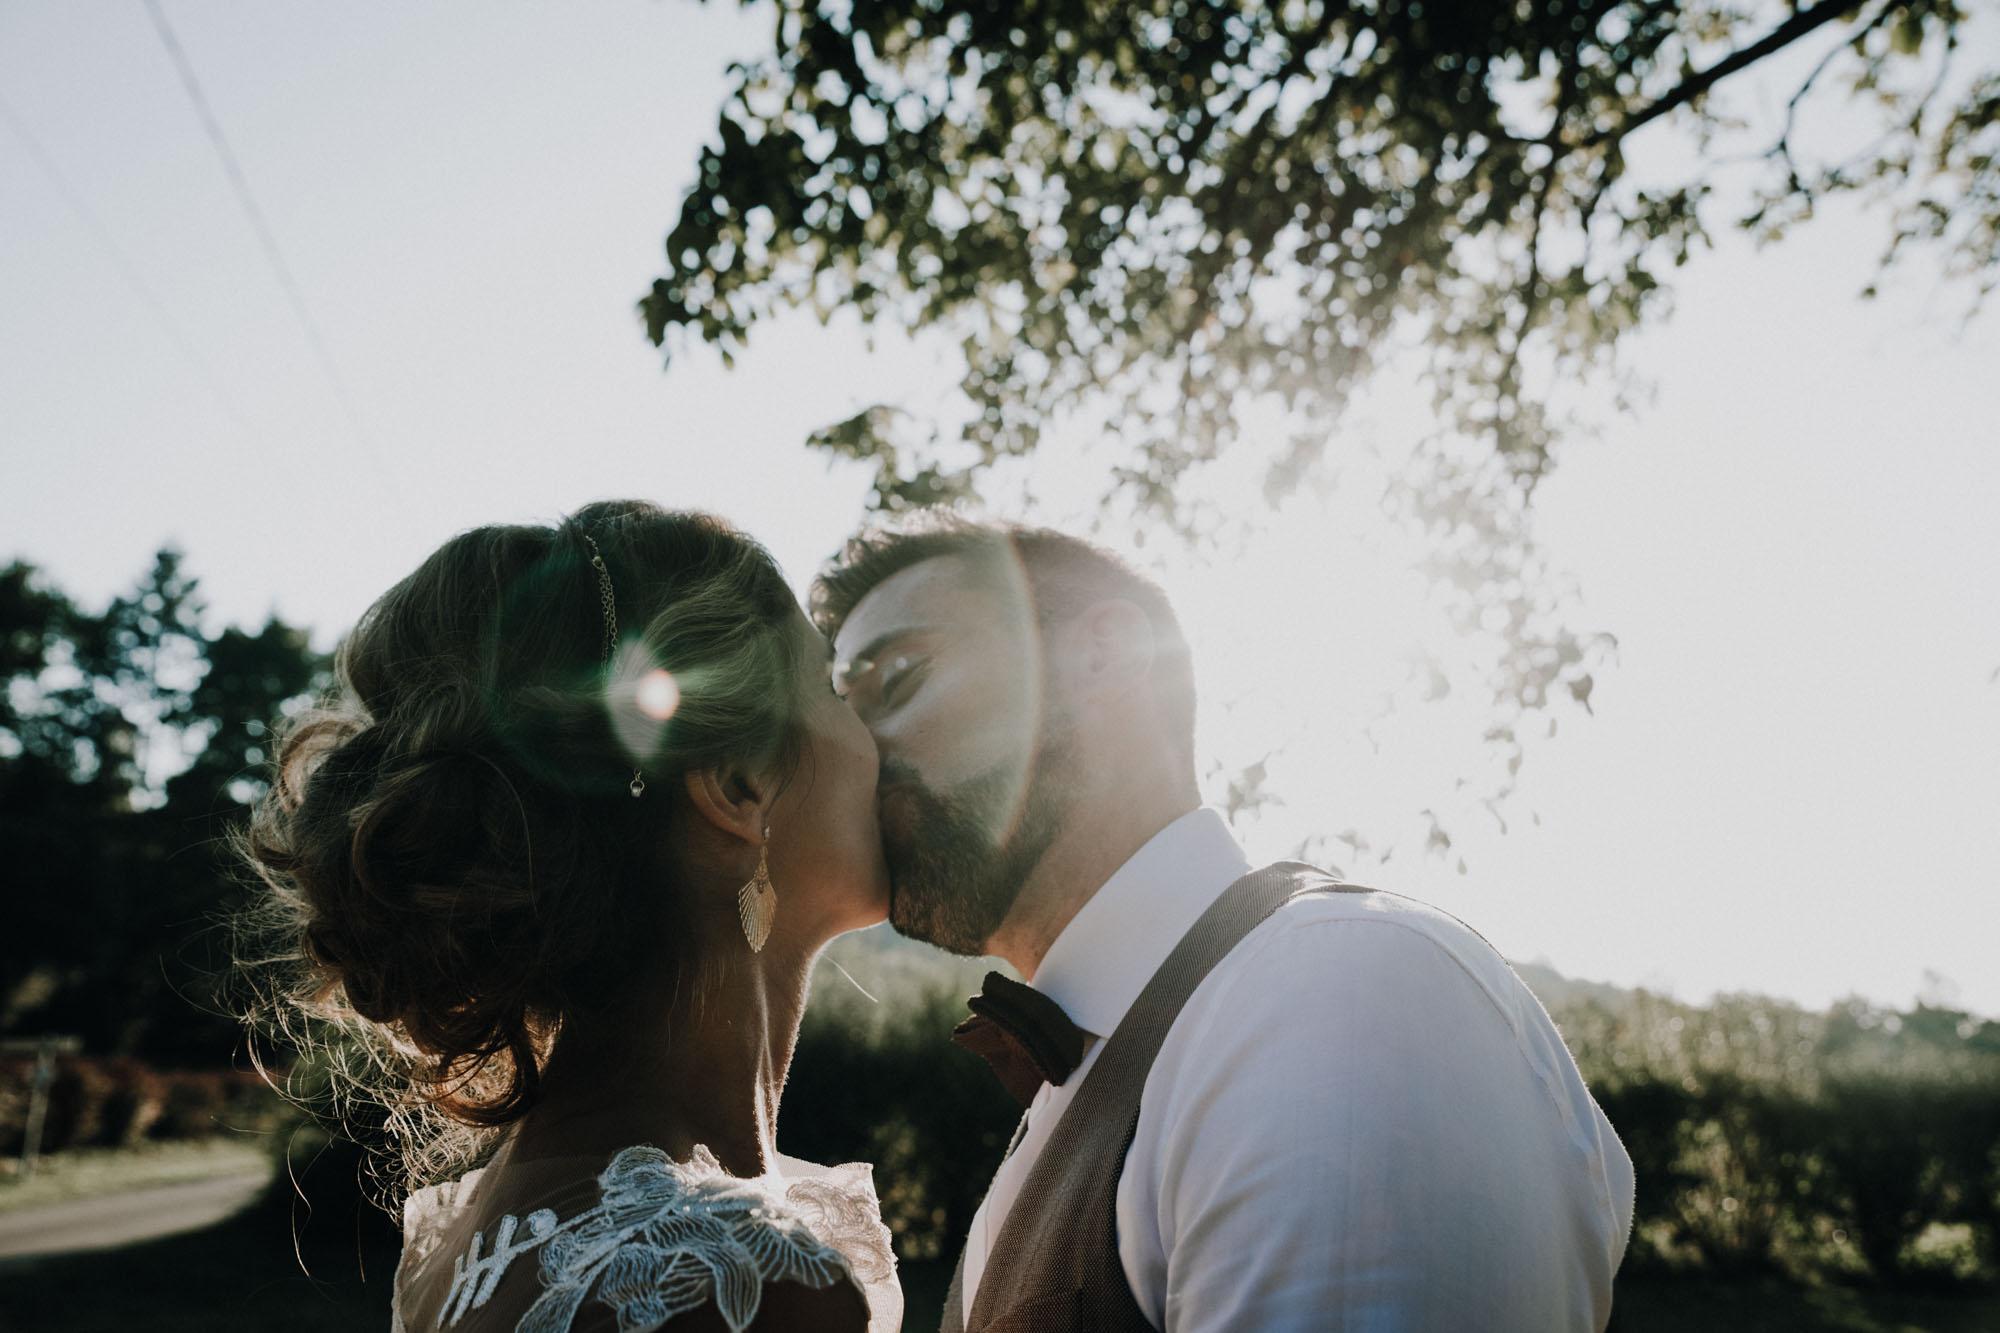 2018-09-29 - LD8_1517 - photographe mariage lyon - laurie diaz - www.lauriediazweeding.com.jpg